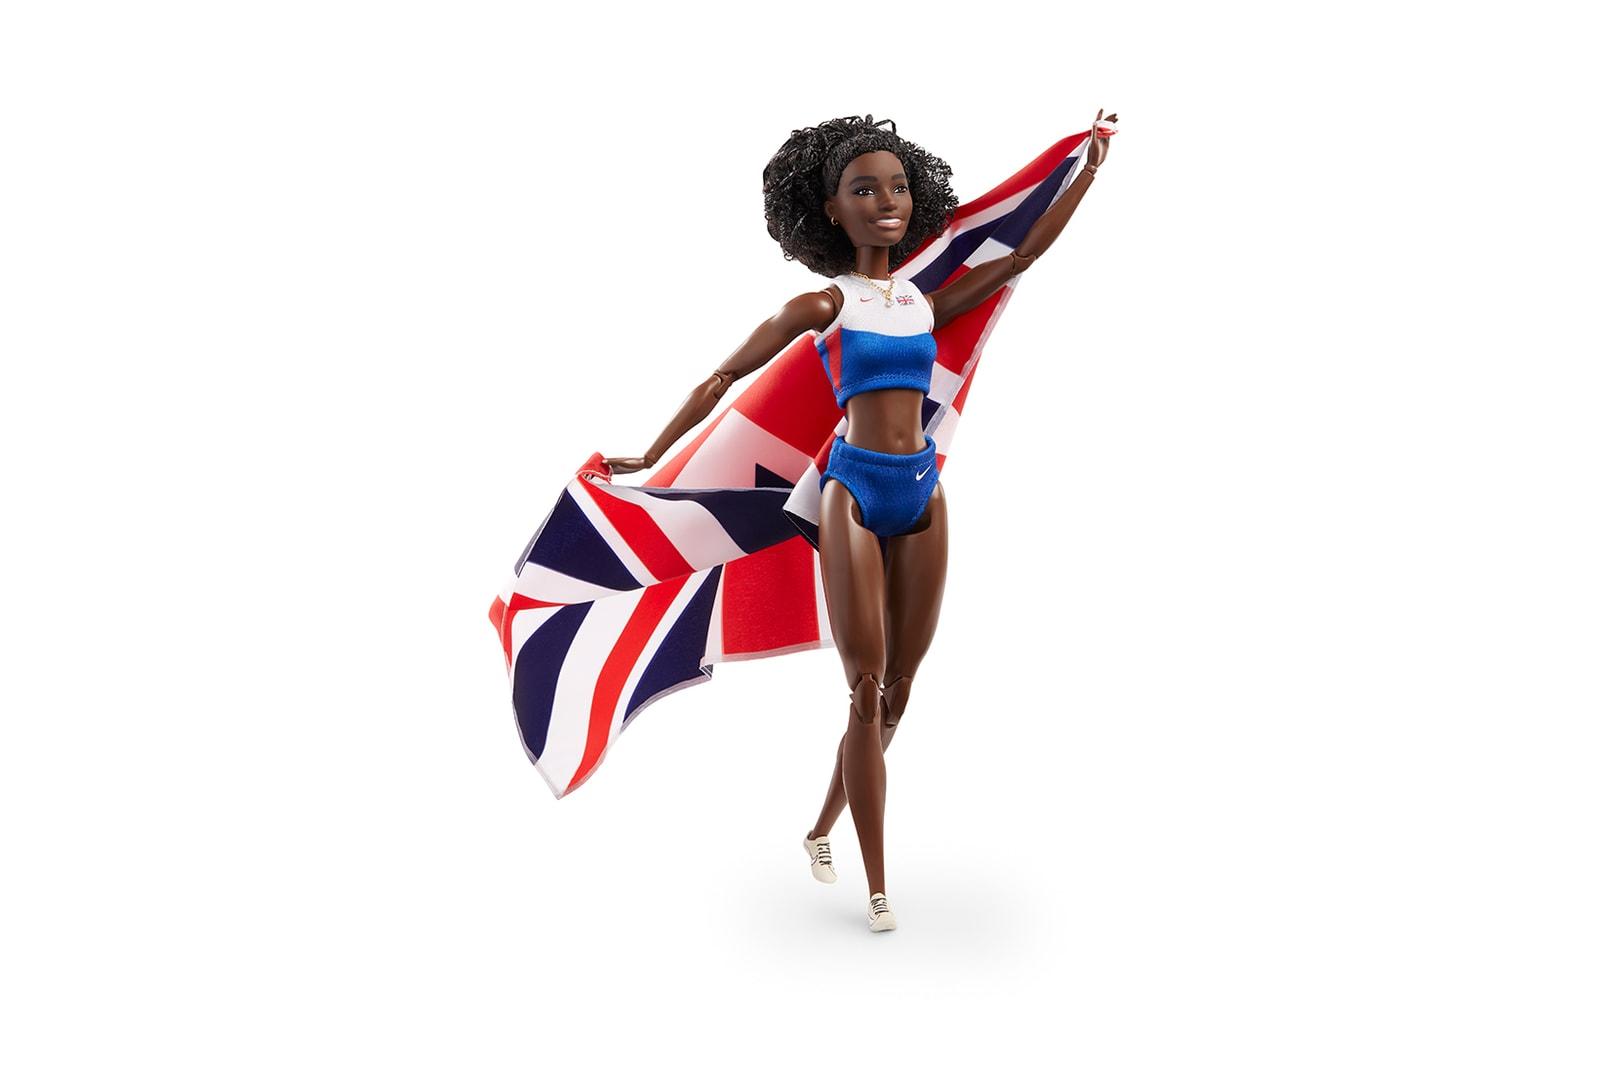 barbie dina asher smith shero doll international womens day dream gap project female empowerment athlete world champion